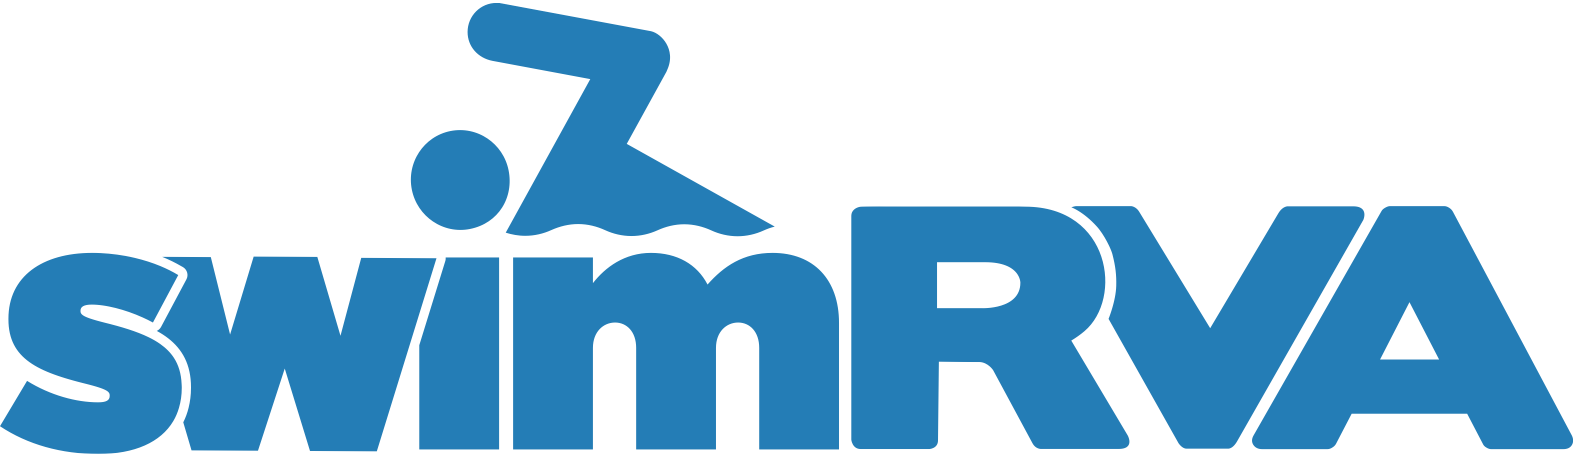 SwimRVA_Logo_MedBlue.png